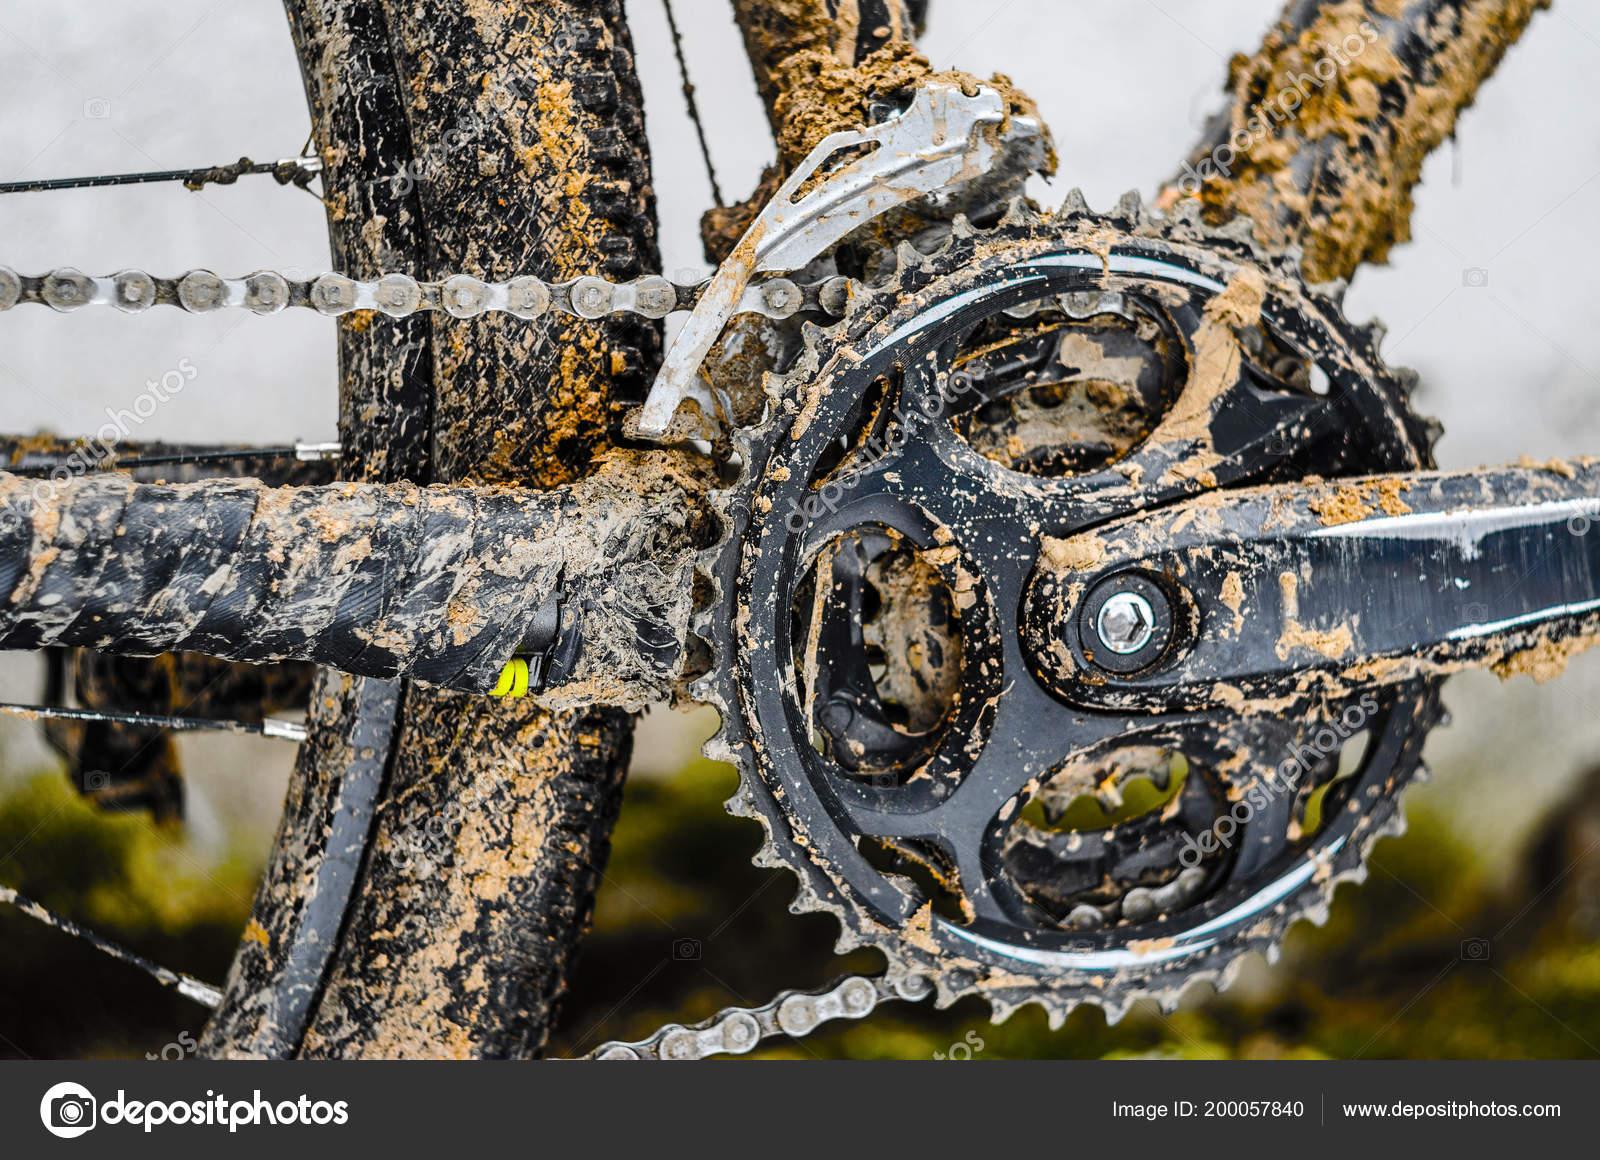 Mountain Bike Transmission Mud Dirty Chain Drive Mountain Bike Riding Stock Photo Image By C V Sot 200057840